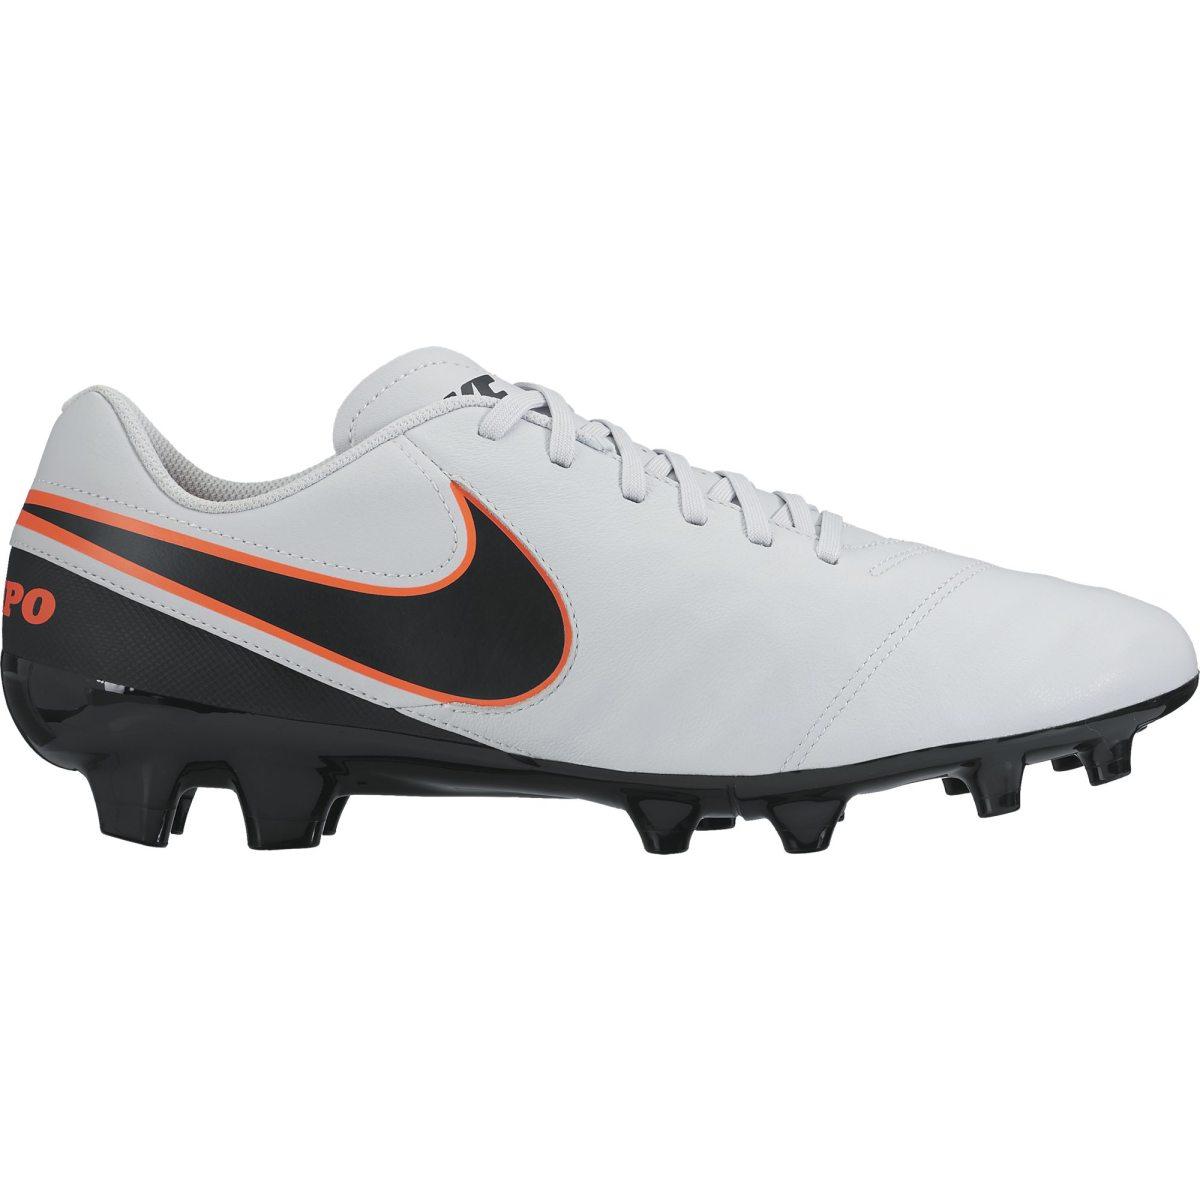 premium selection 295f1 bce5d nike tiempo genio ii leather fg q1 16 fotbollssko senior fotbollsskor